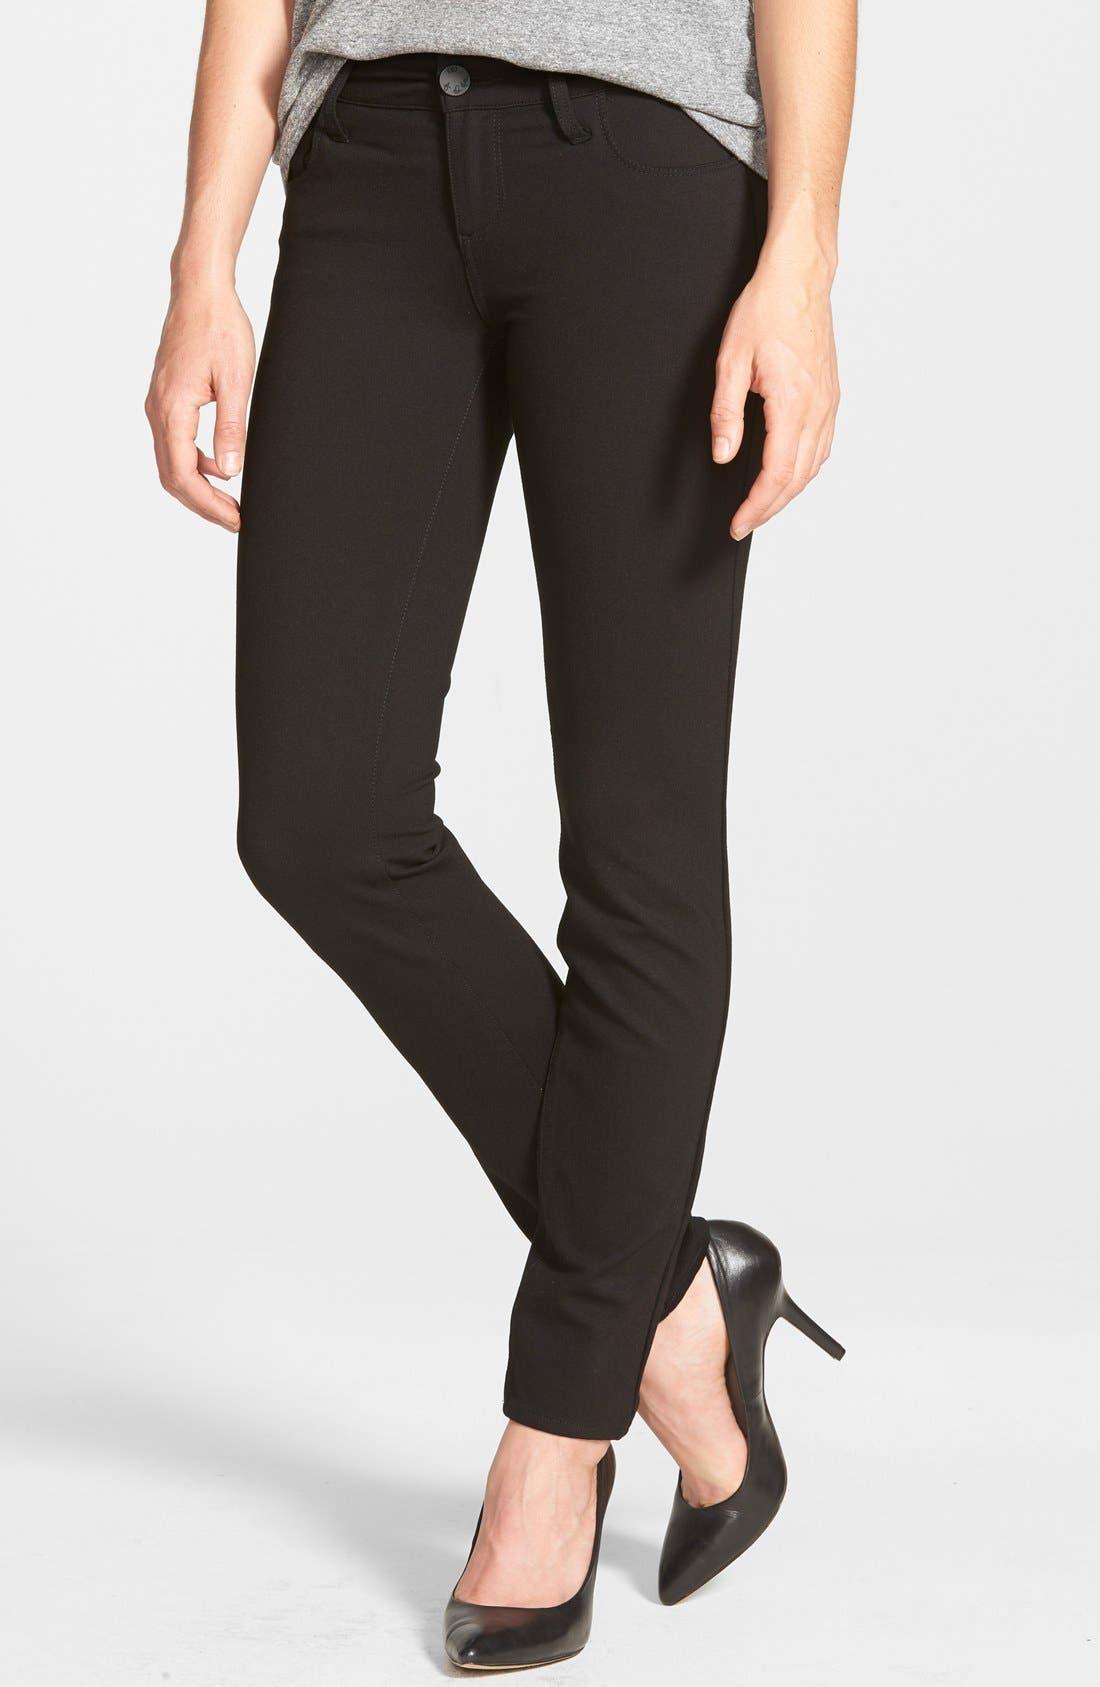 KUT from the Kloth 'Mia' Stretch Knit Five-Pocket Skinny Pants